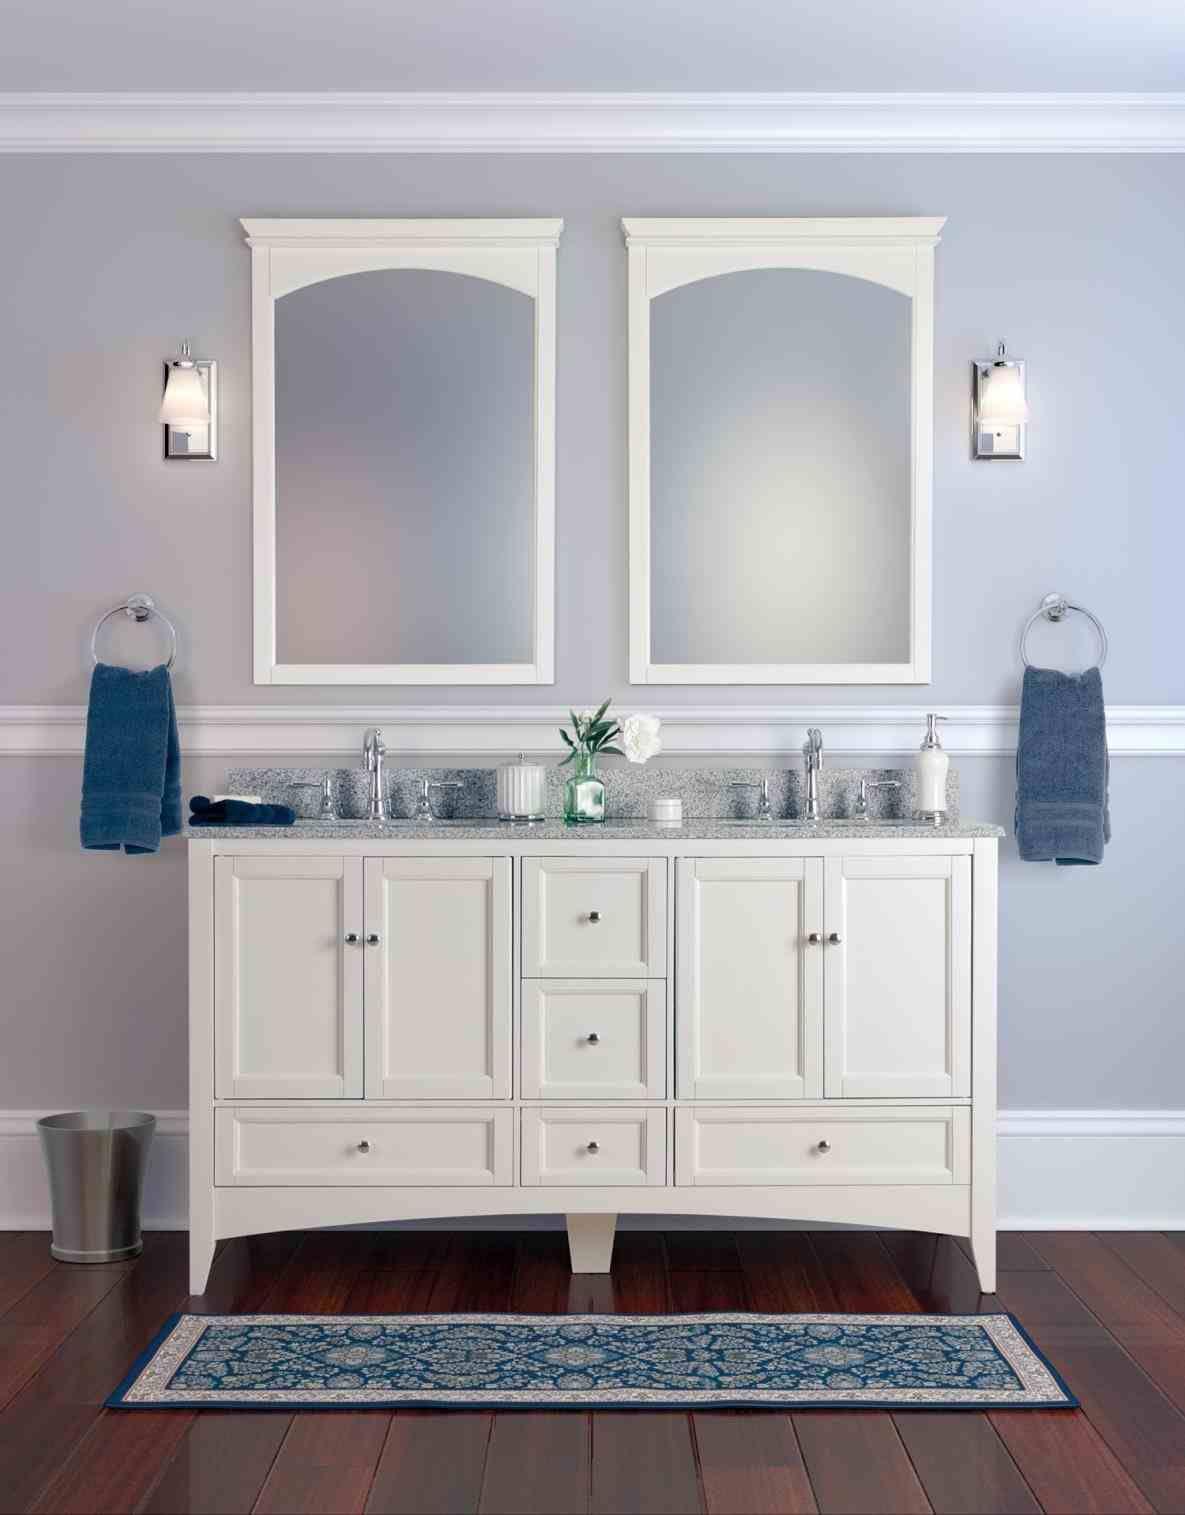 gray bathroom cabinets blue walls | Home Ideas | Pinterest | Grey ...